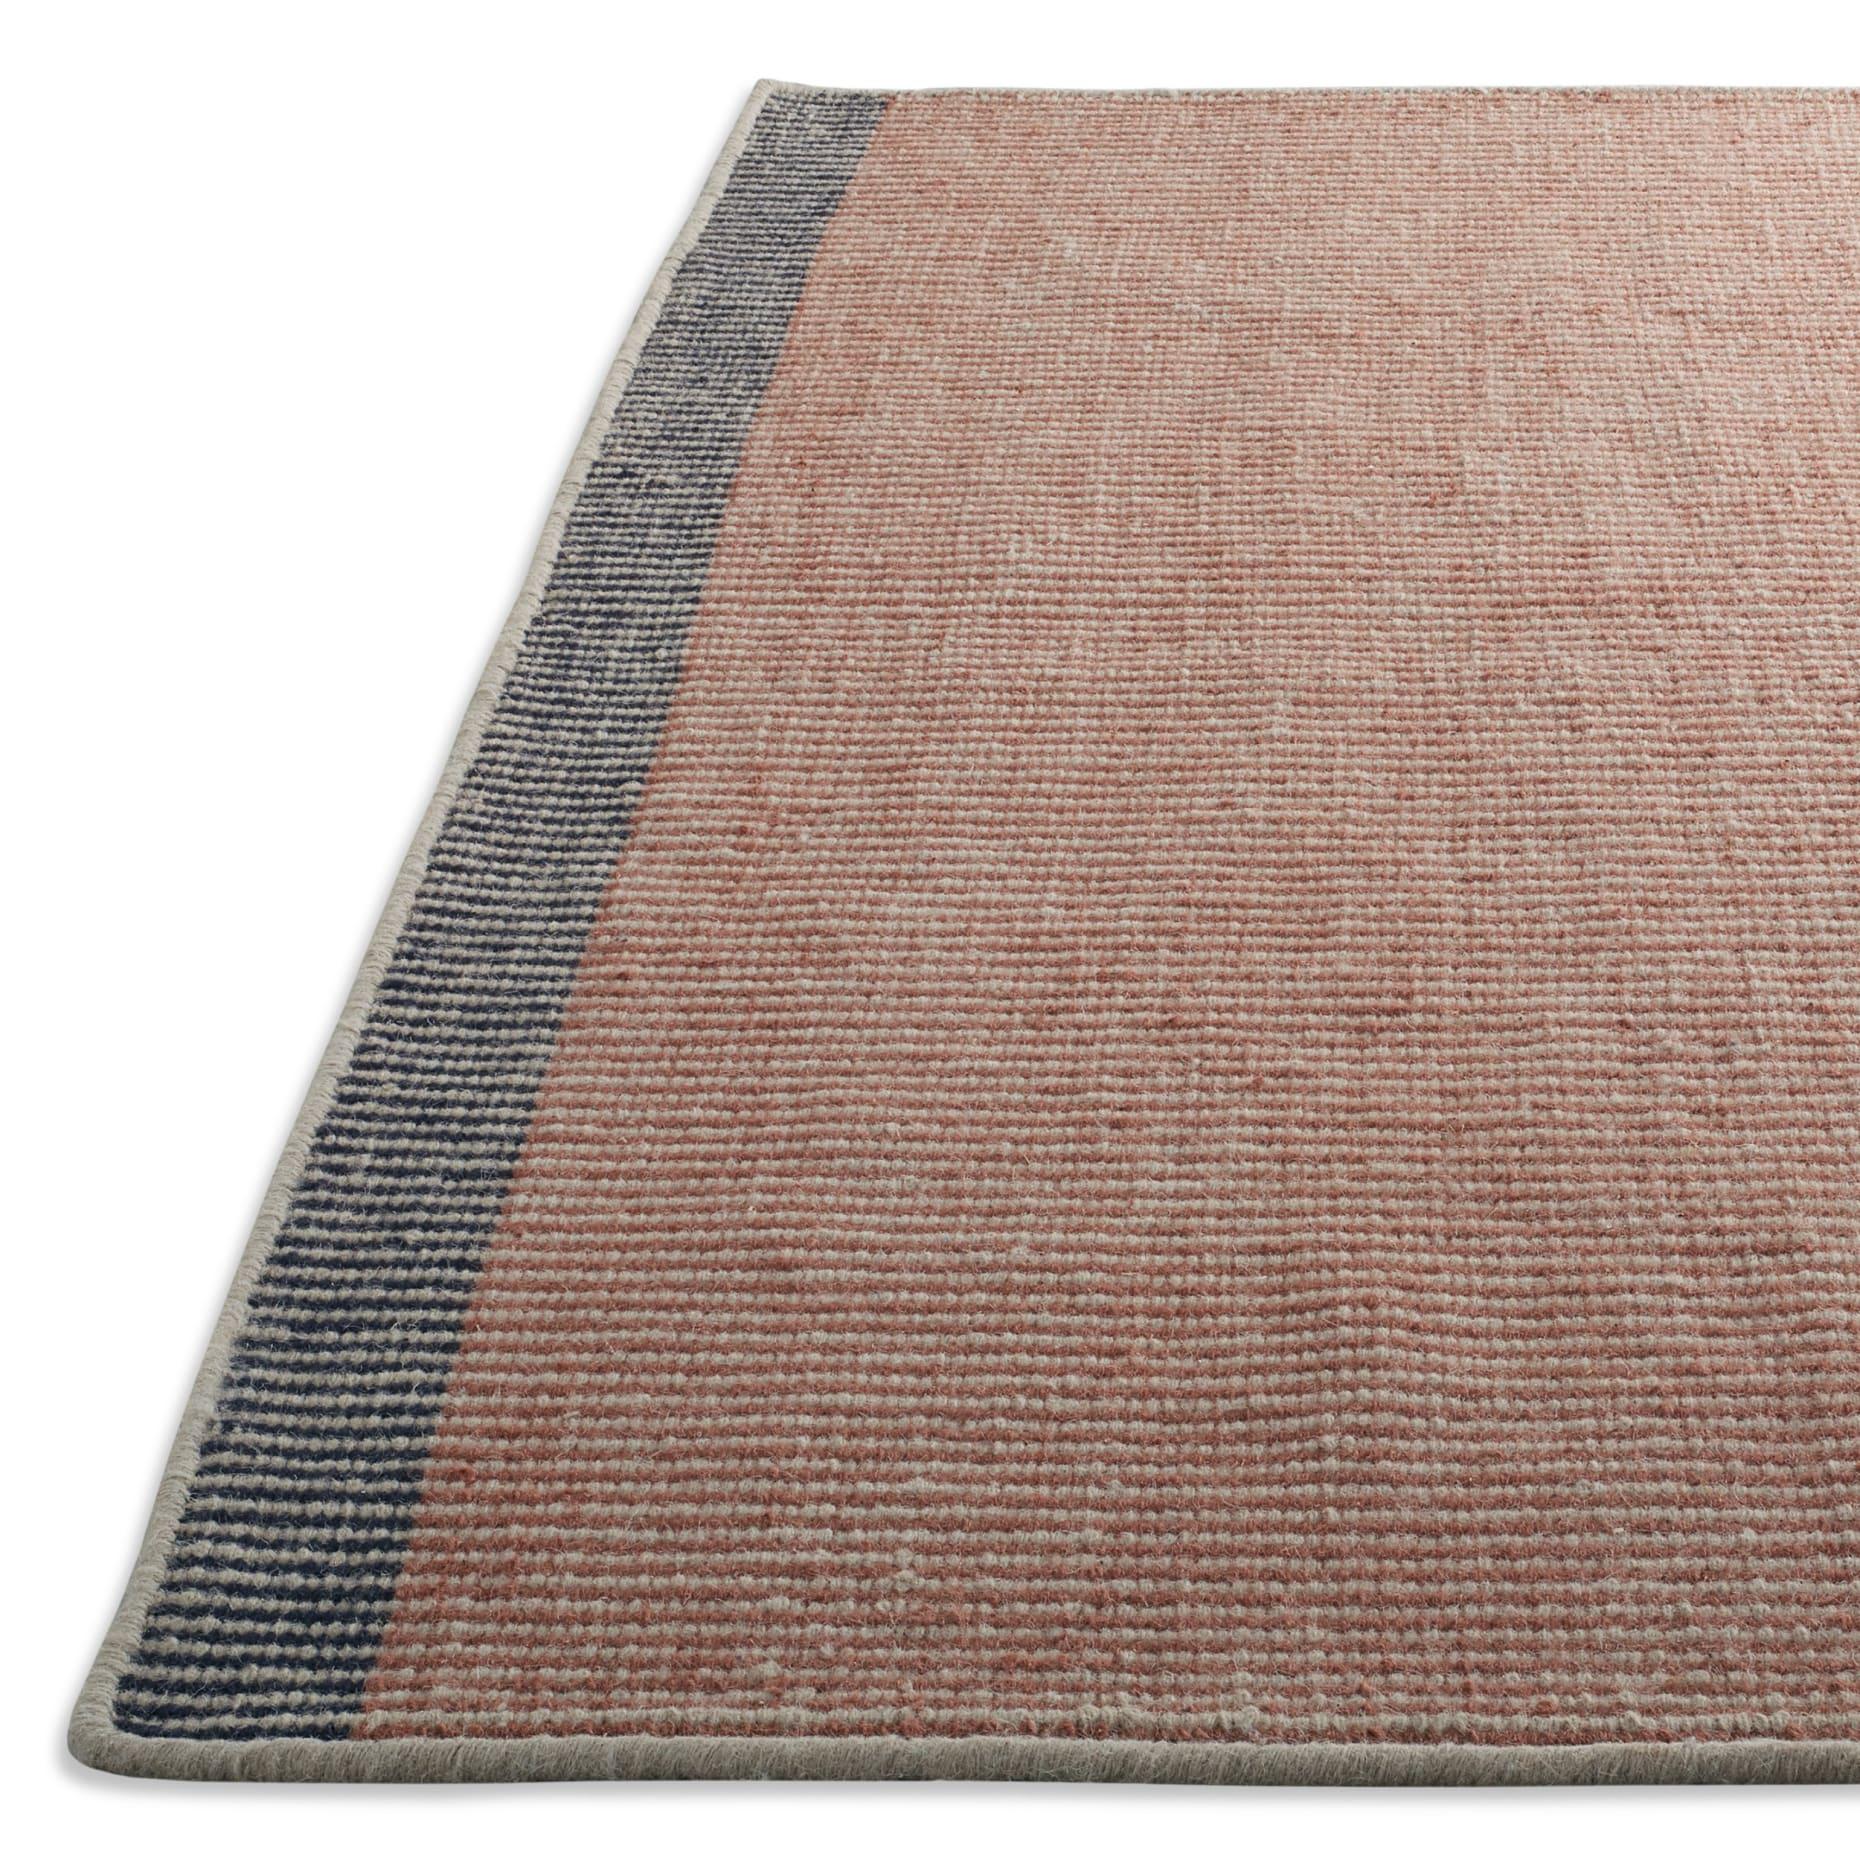 ru1 bsta6x9 cm3 lowdetail bousta rug color mix 3